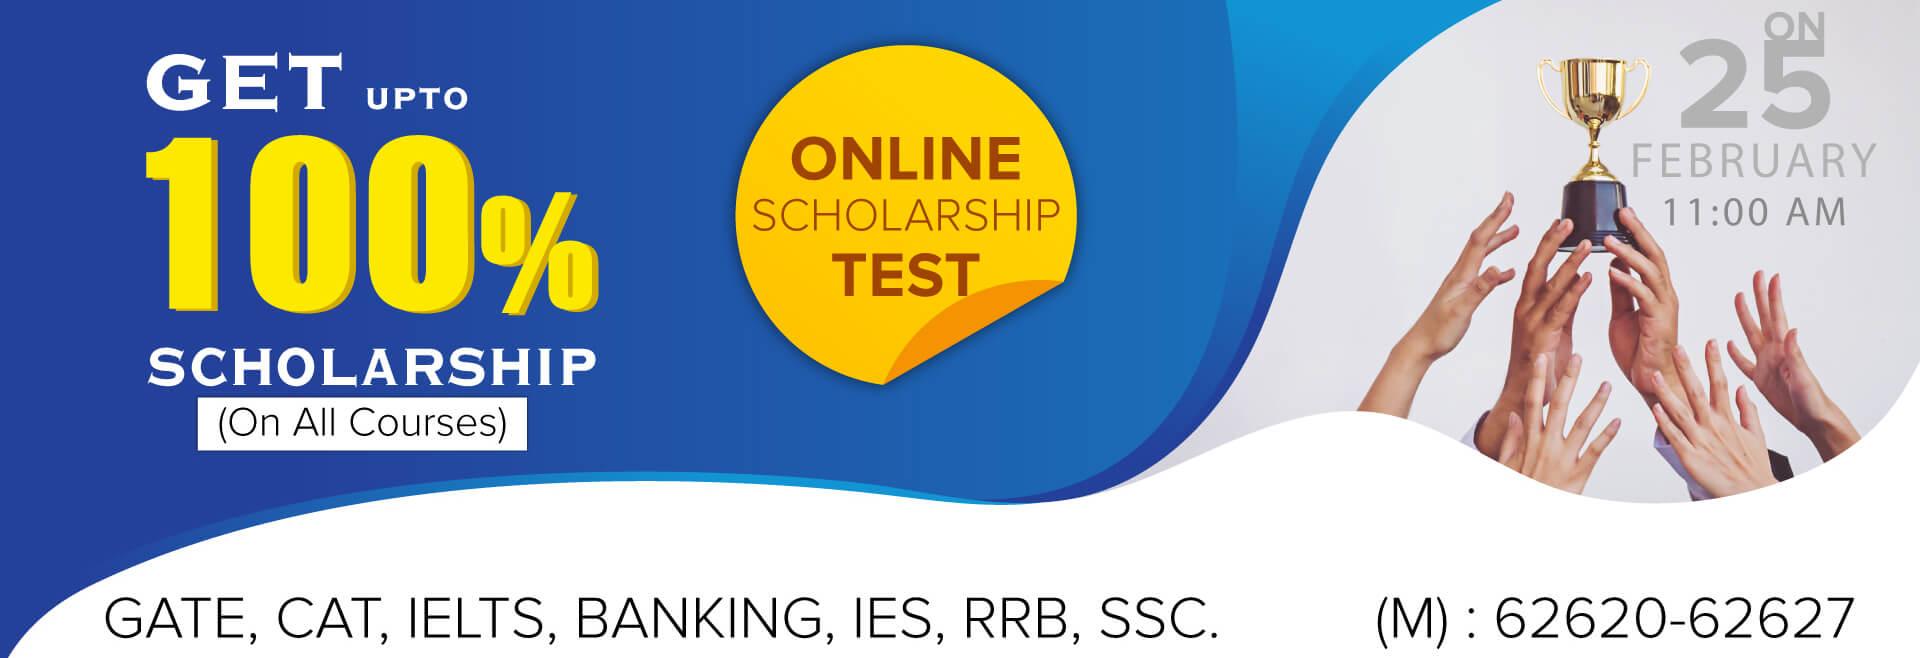 GATEFLIX Online Scholarship Test